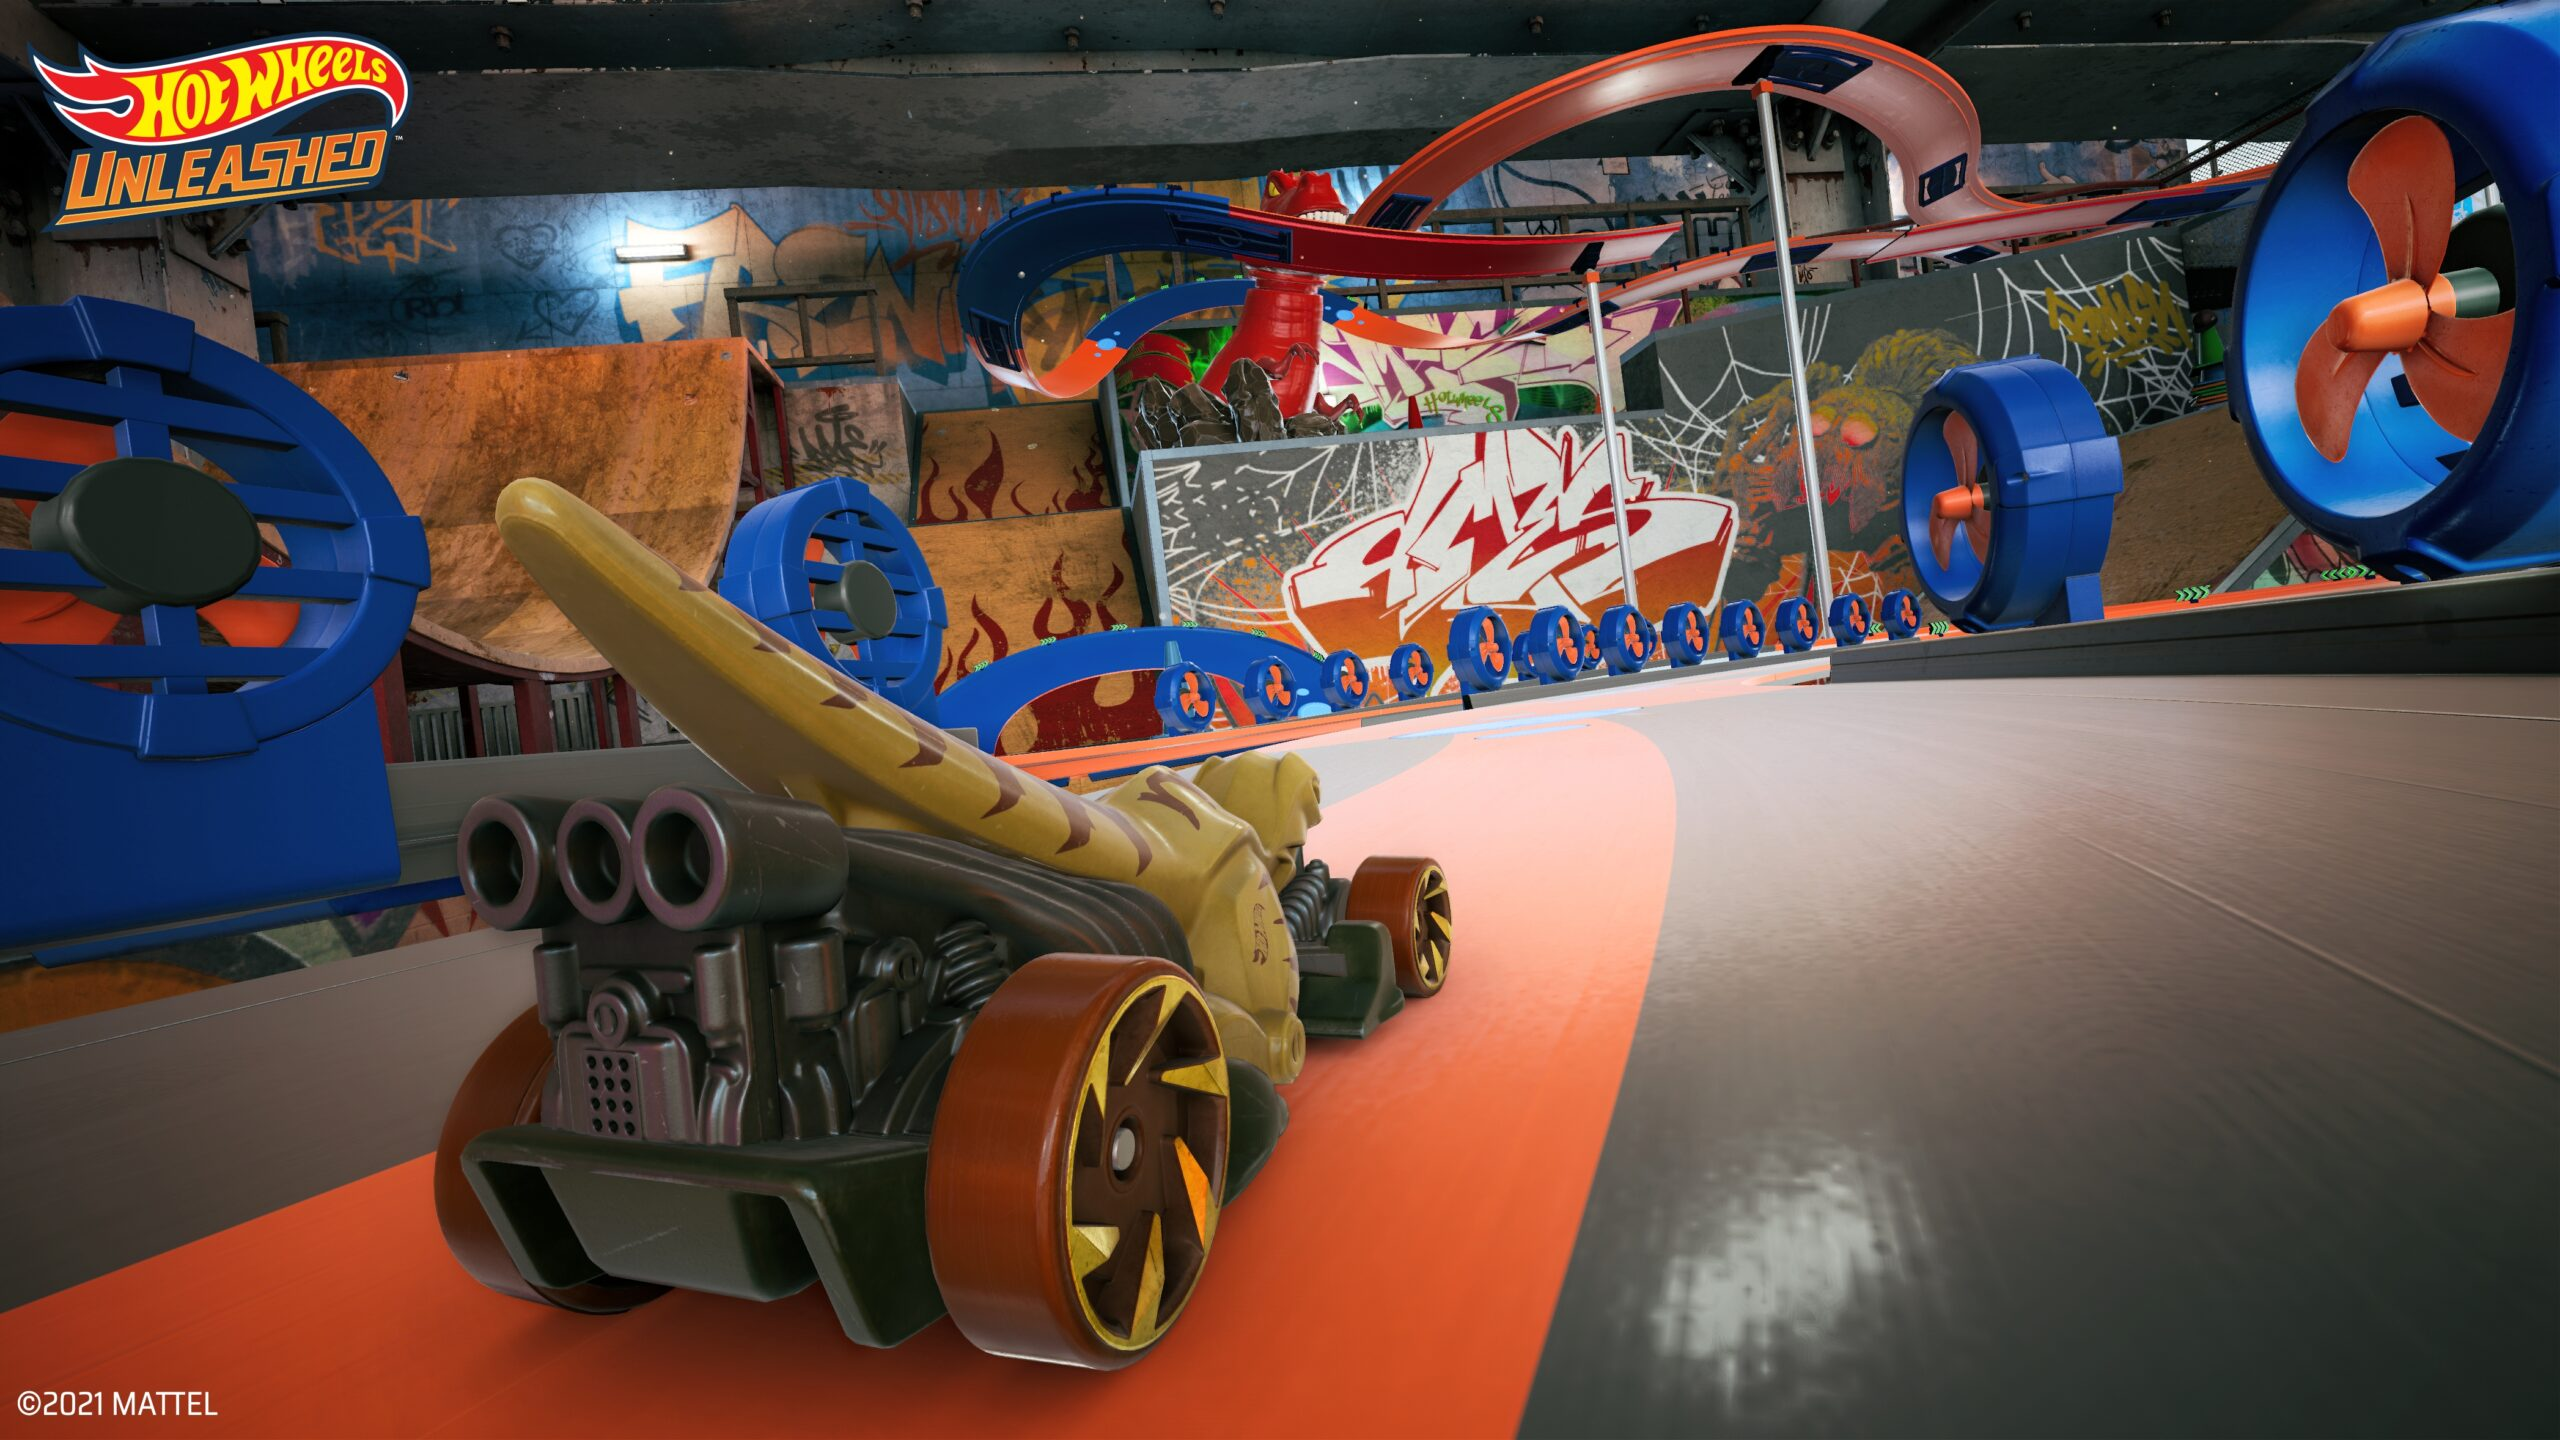 Hot-Wheels-Unleashed_2021_06-10-21_003